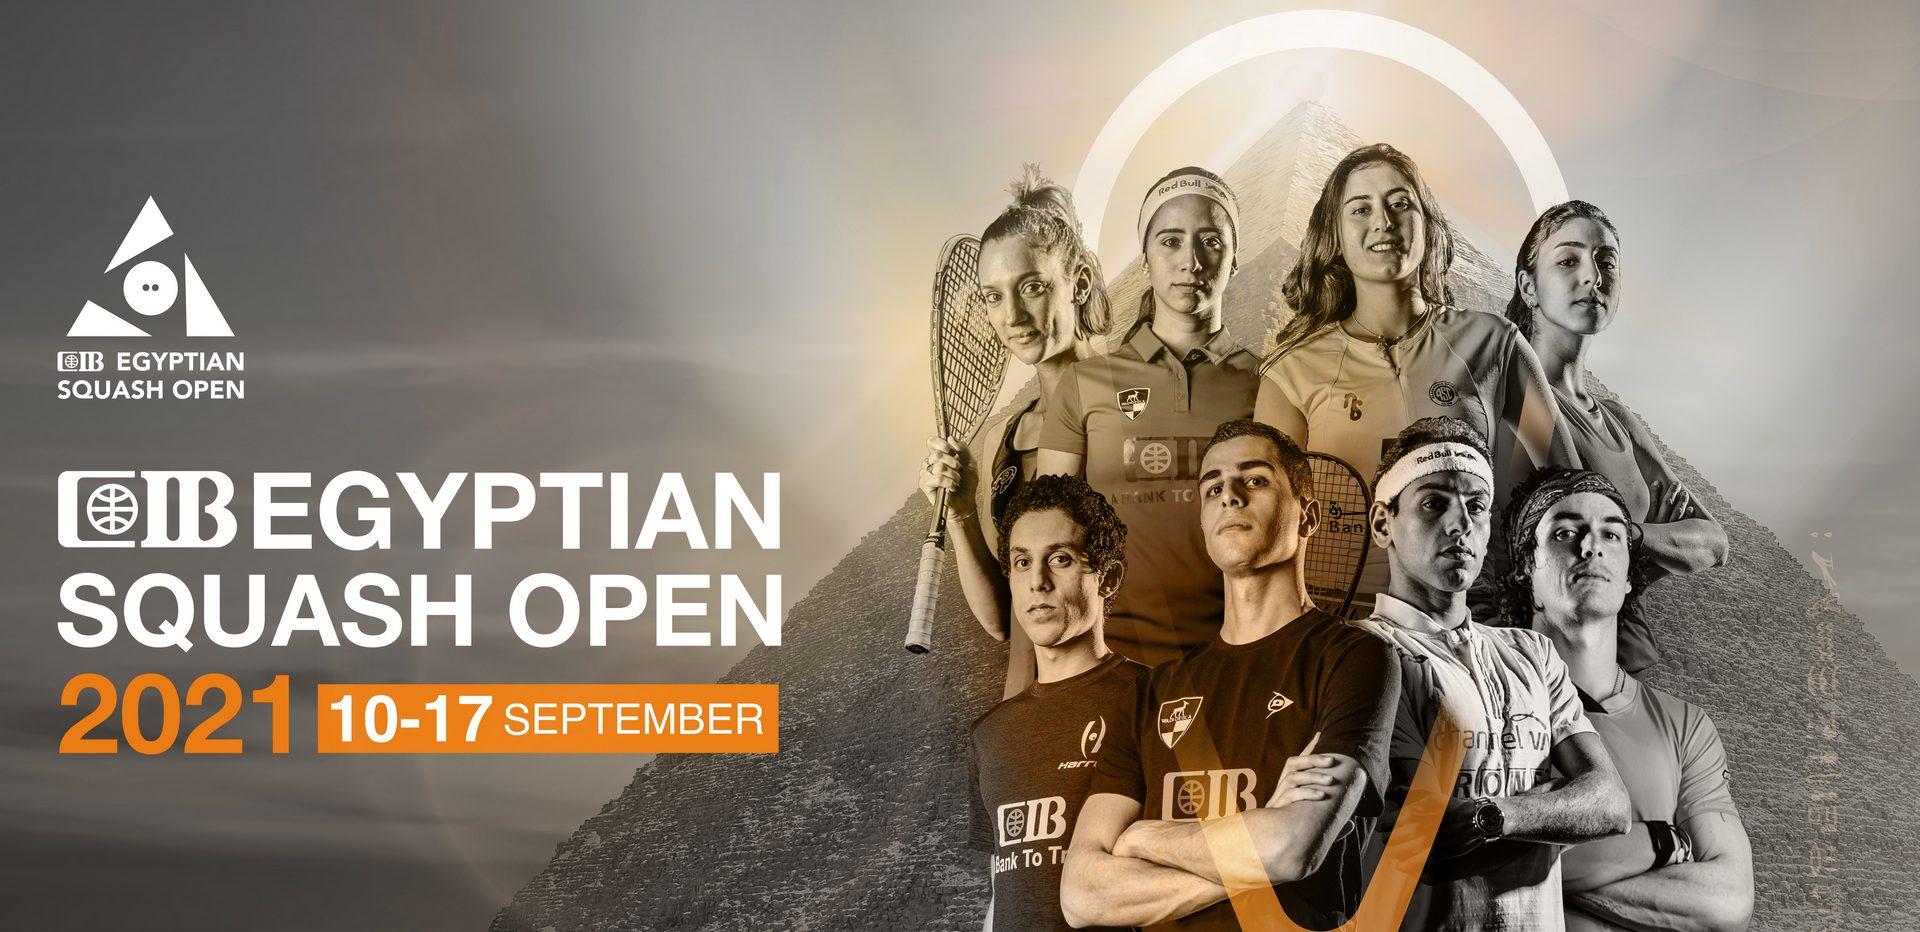 CIB Egyptian Squash Open 2021